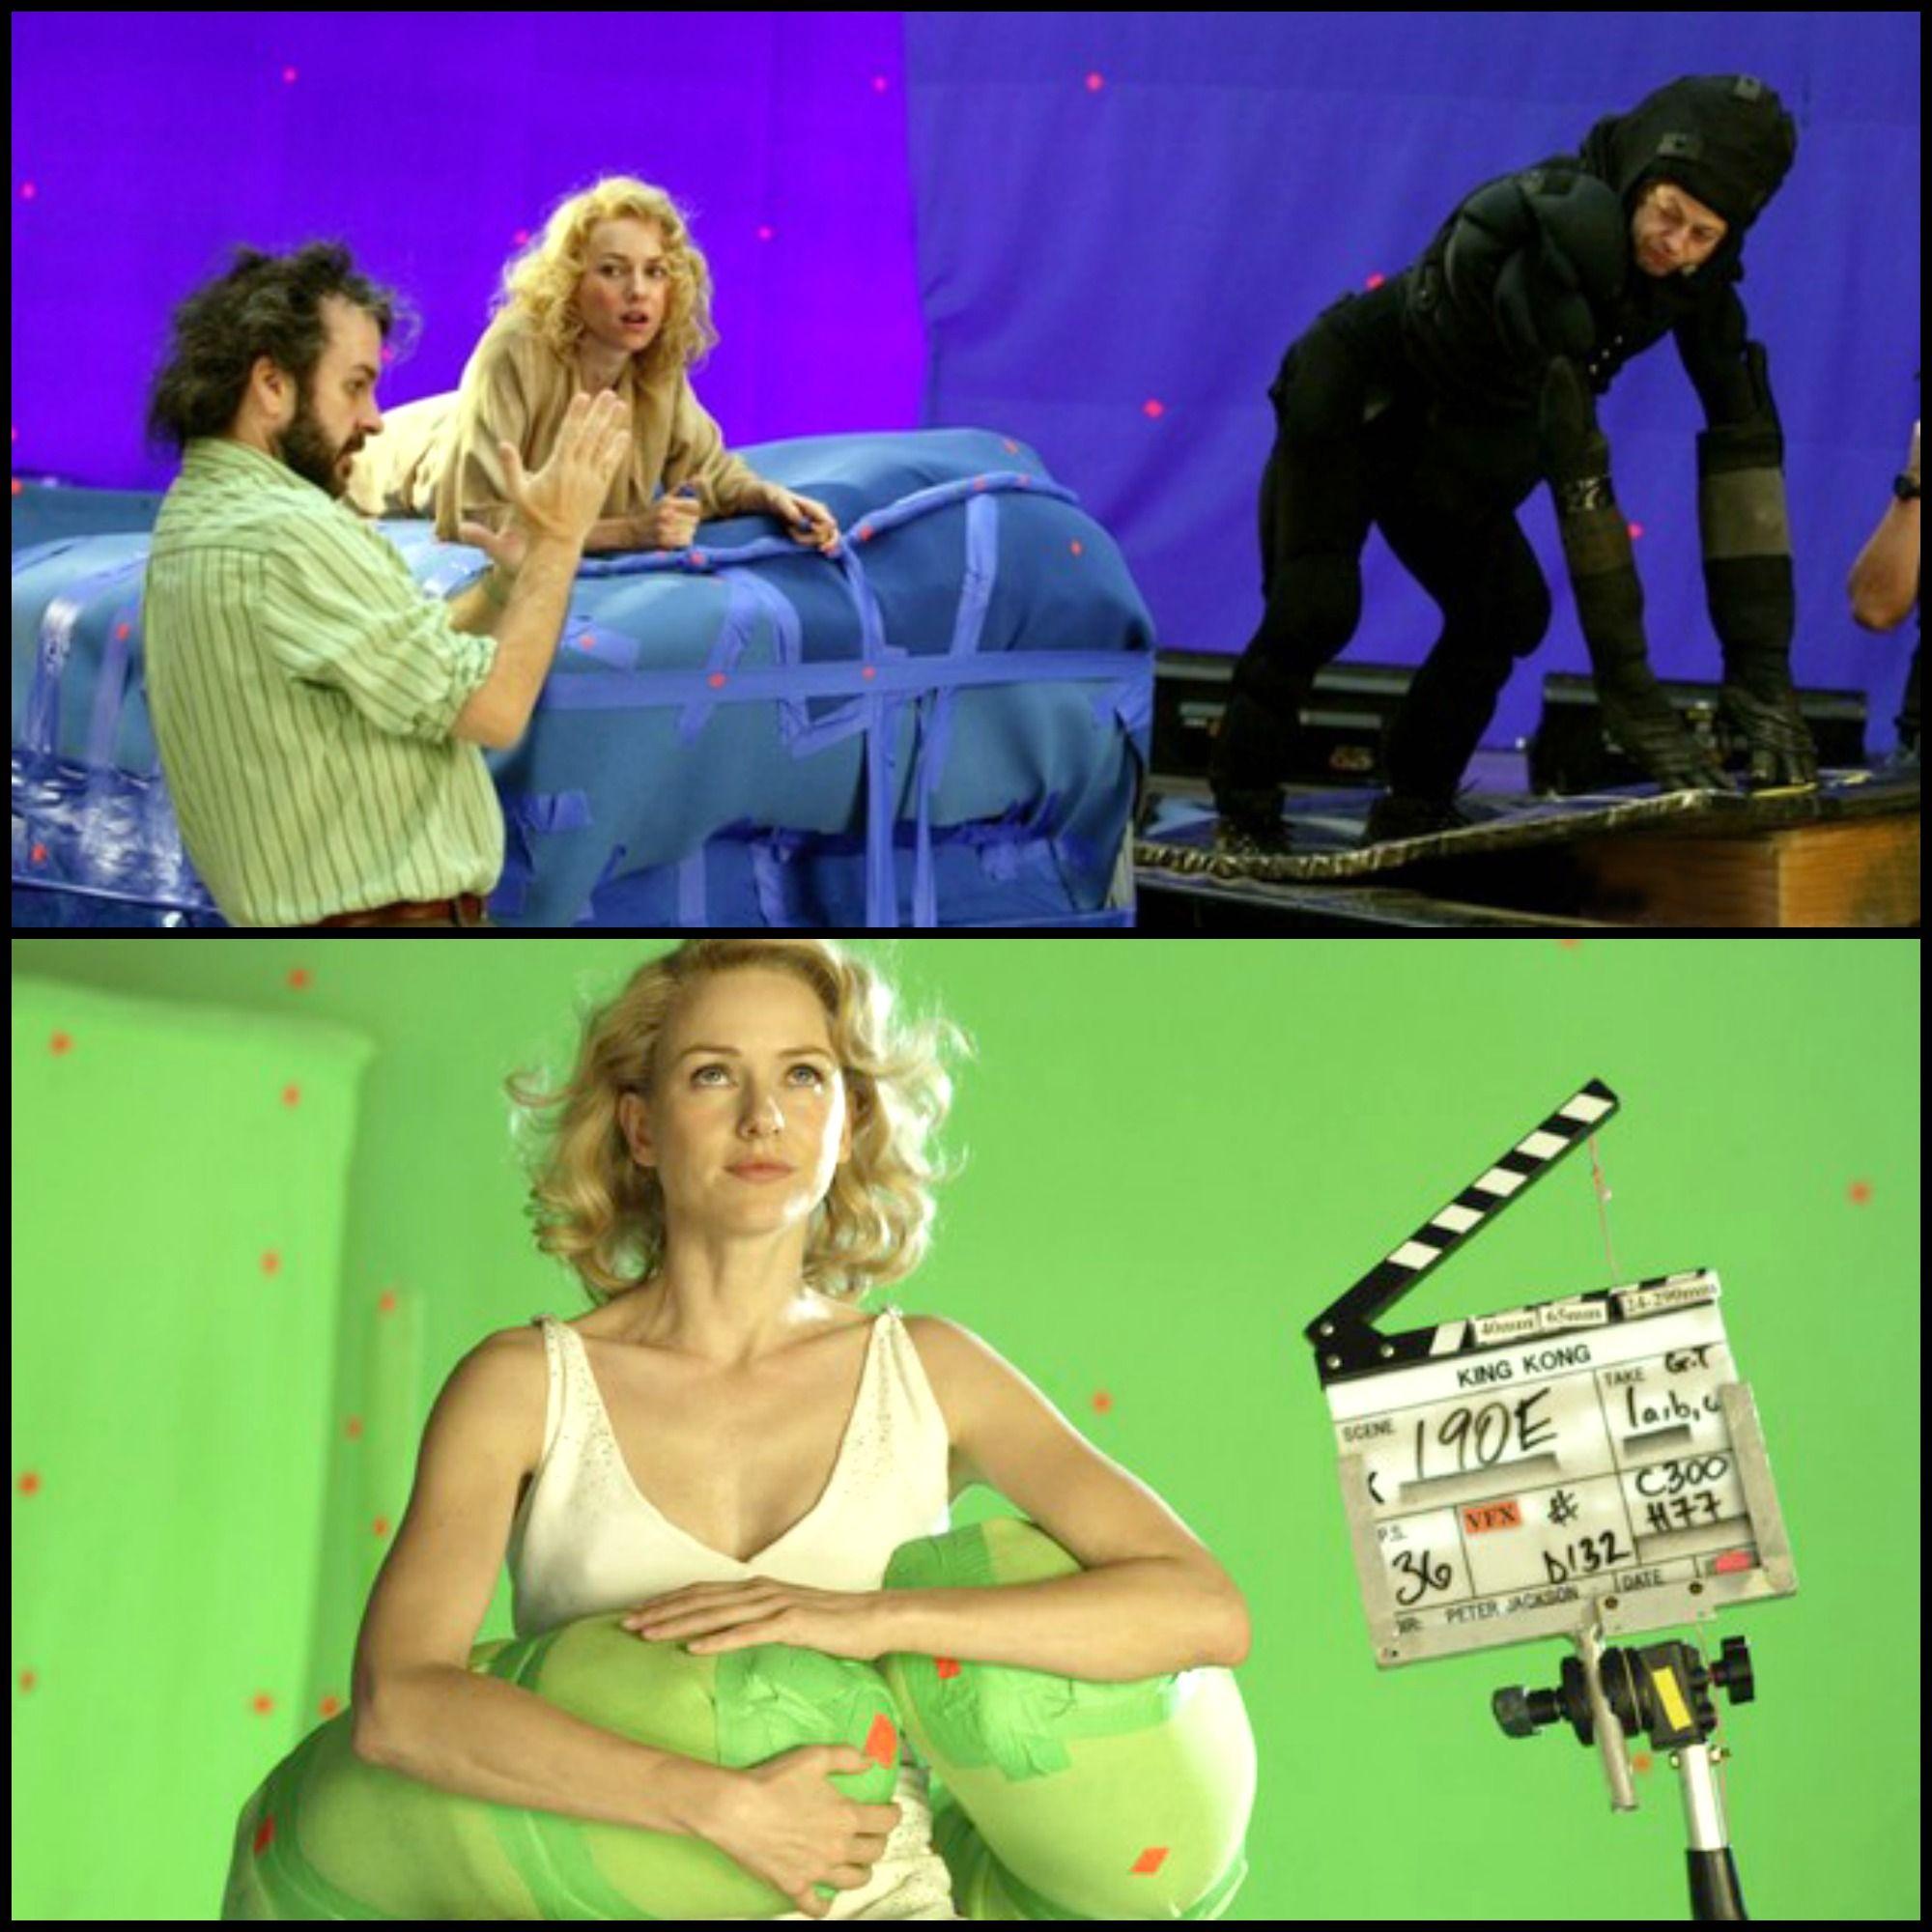 King Kong 2005 Behind The Scenes Hey There Andy Serkis Cine Cinematografia Detras De Camaras